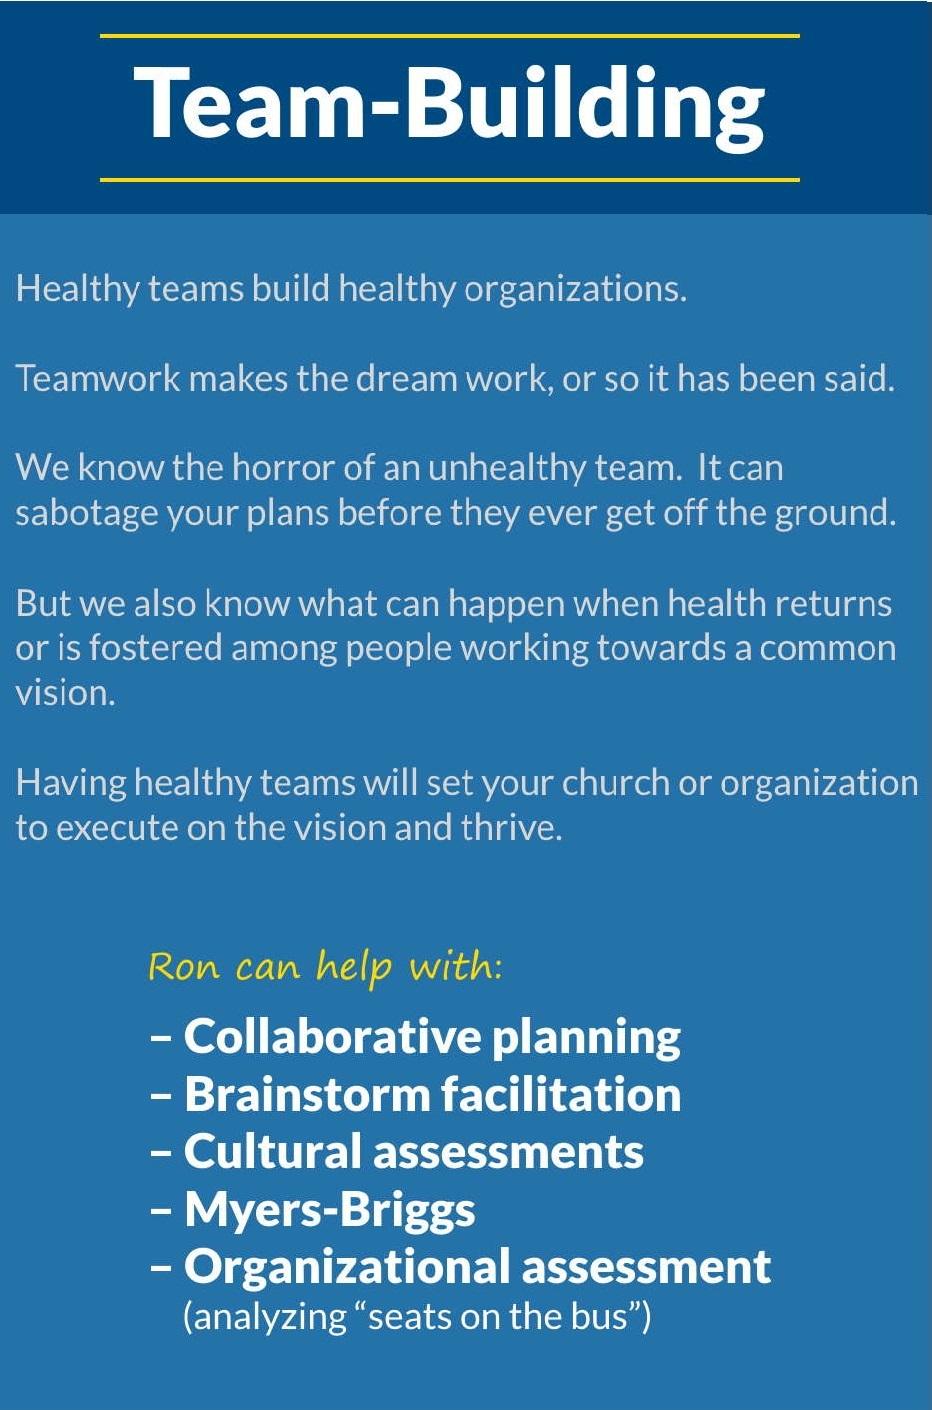 5T Leadership - Team Building